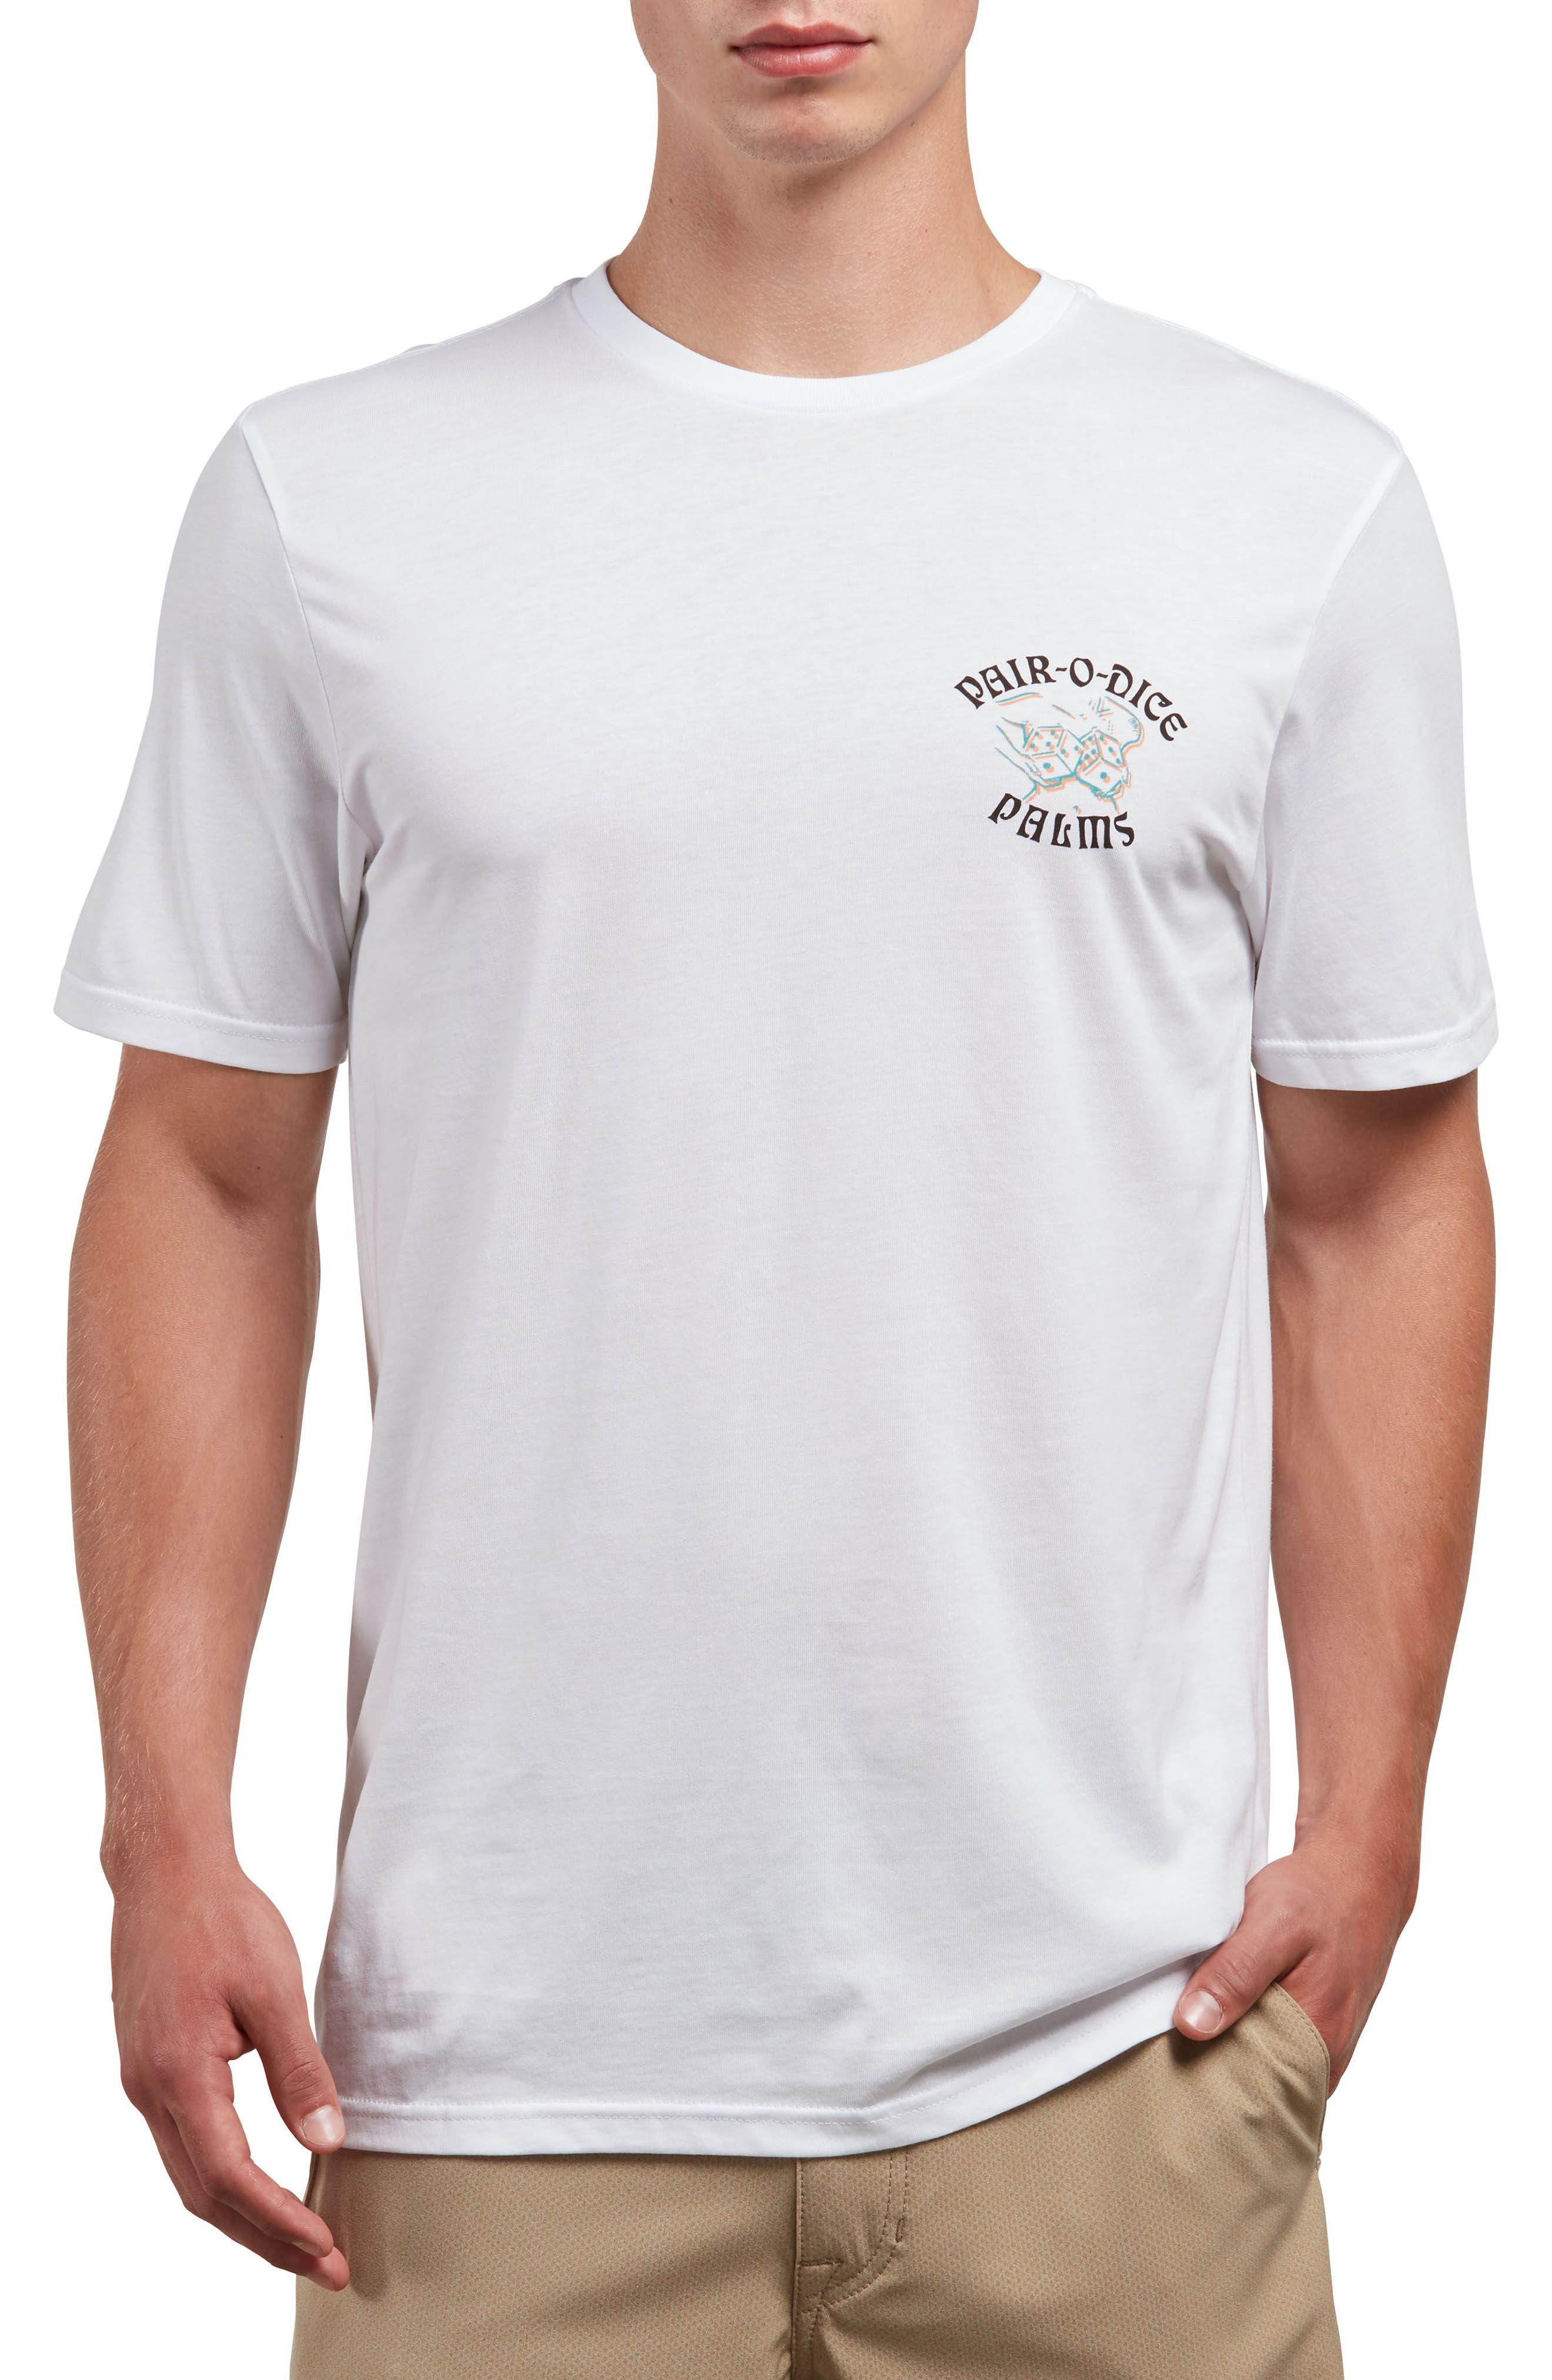 Pair-O-Dice T-Shirt,                         Main,                         color, White